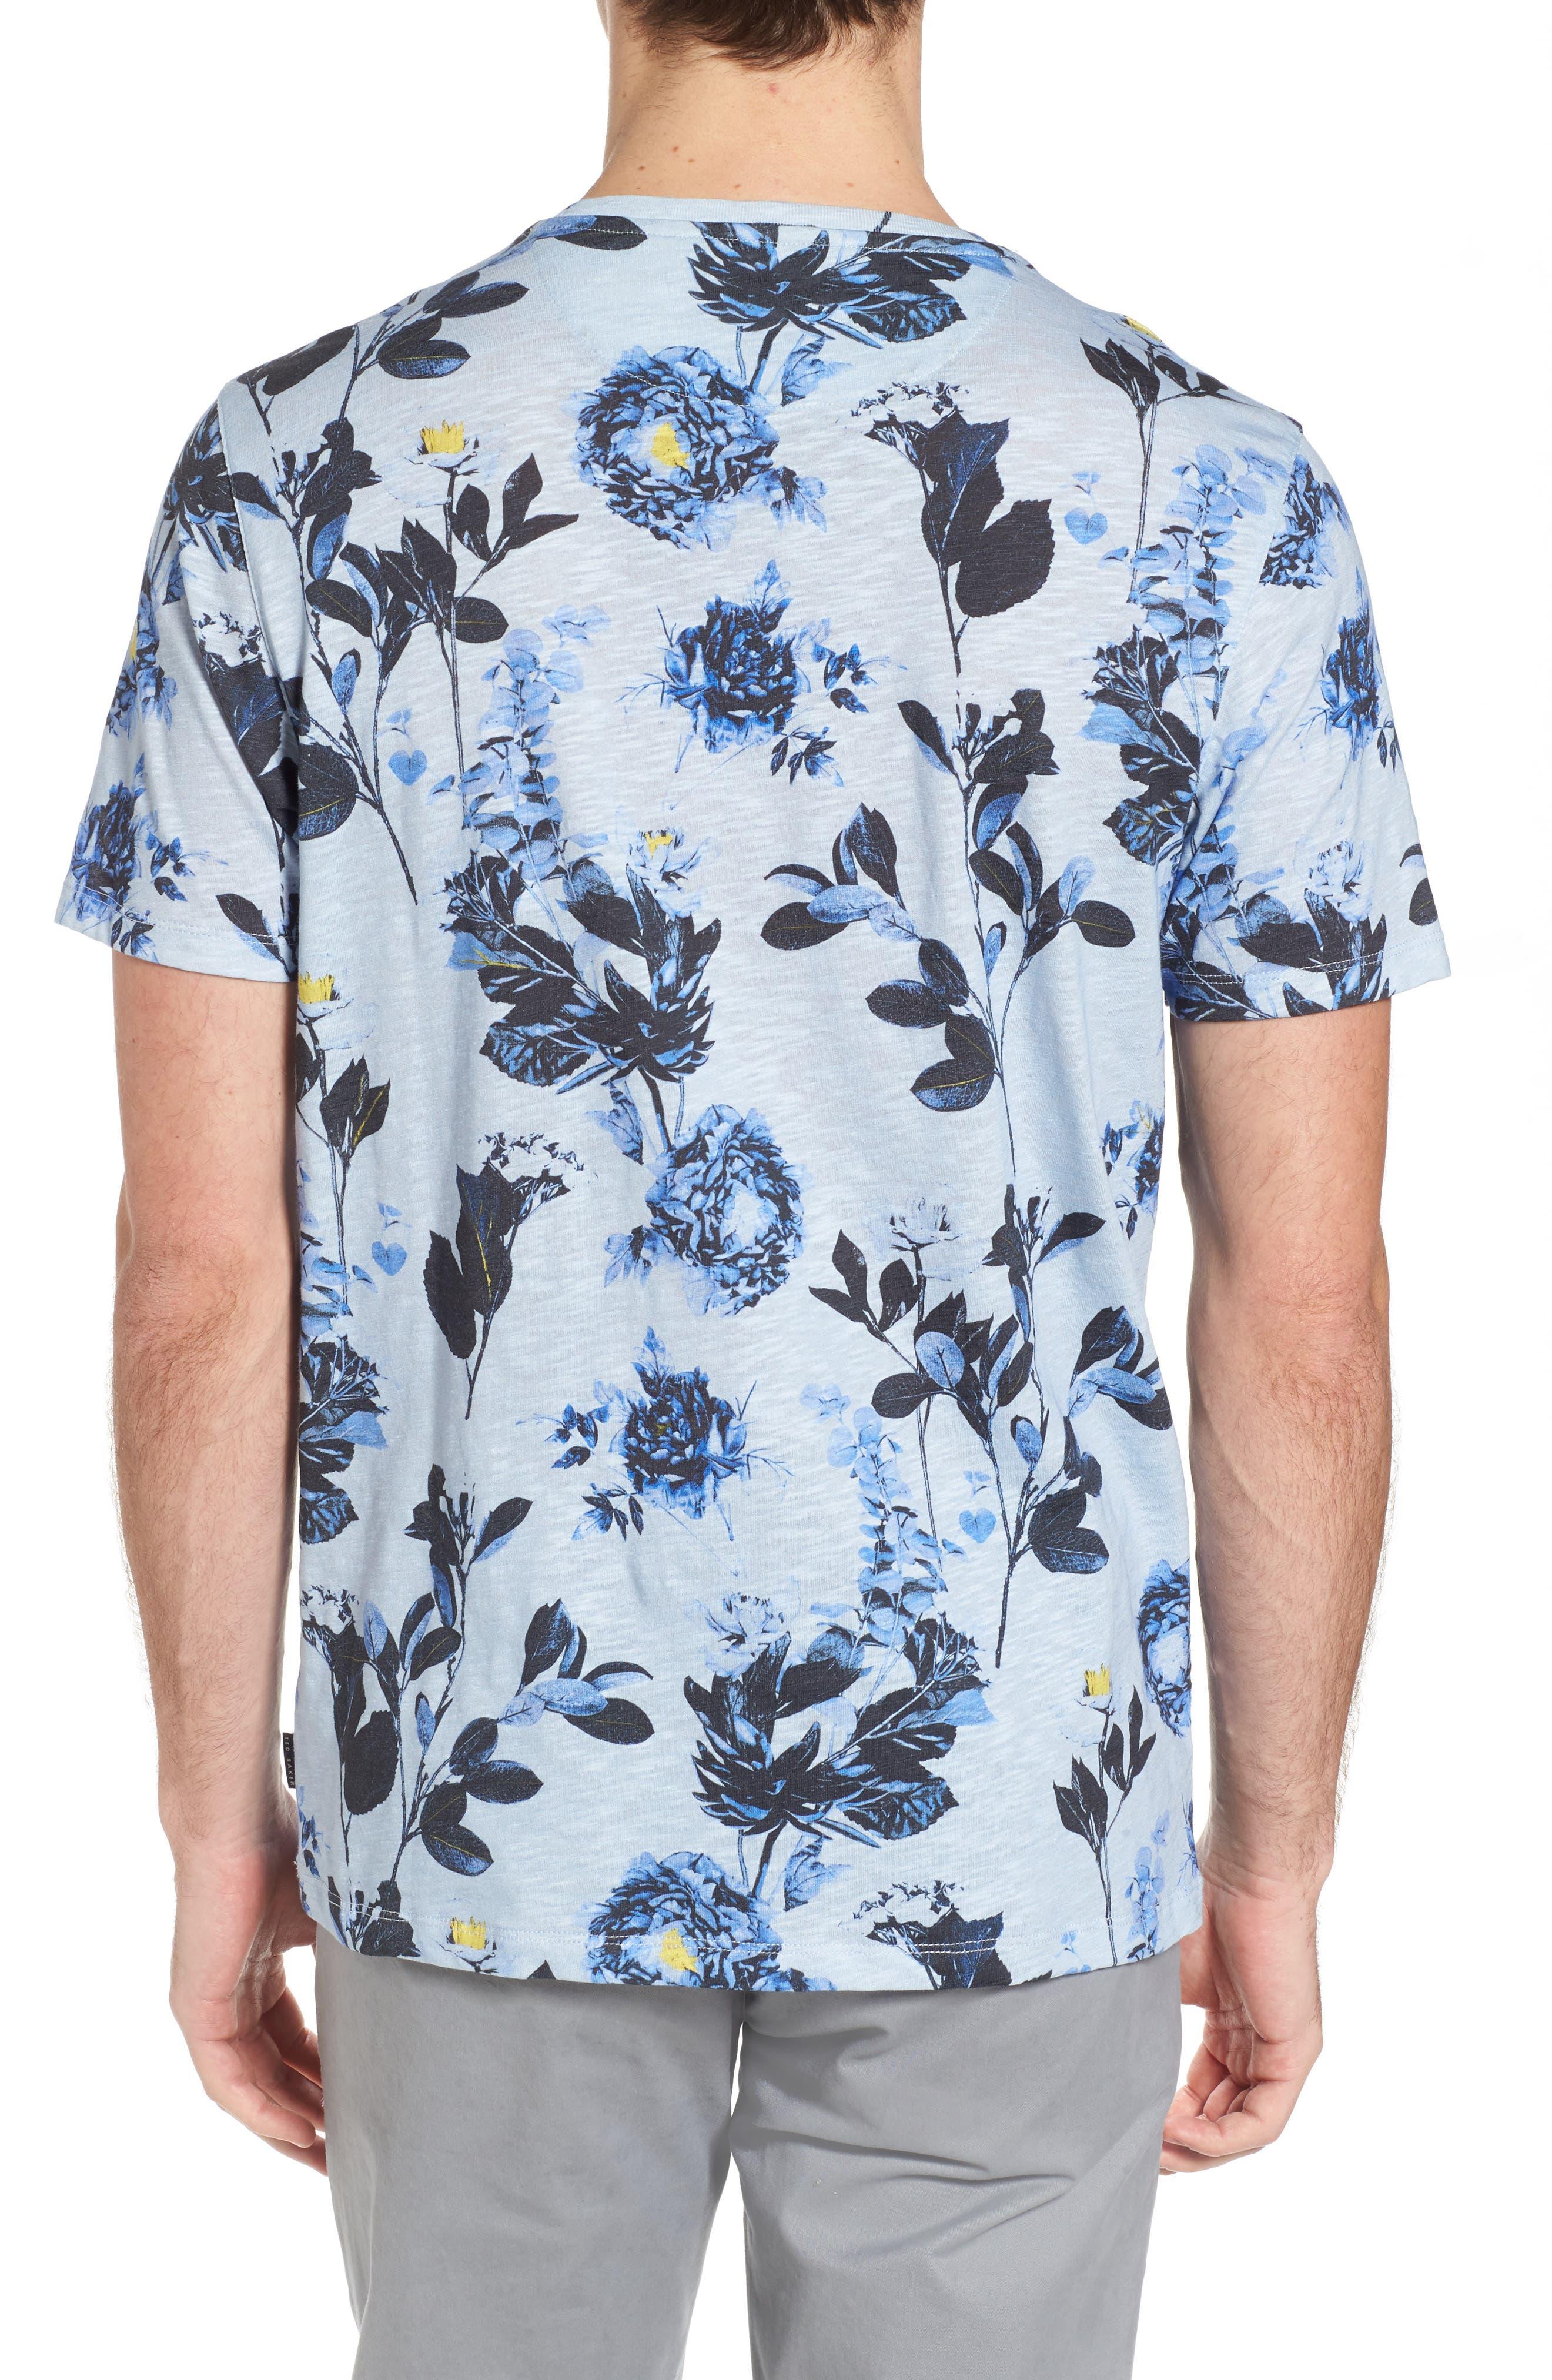 Doberma Trim Fit Floral Print T-Shirt,                             Alternate thumbnail 4, color,